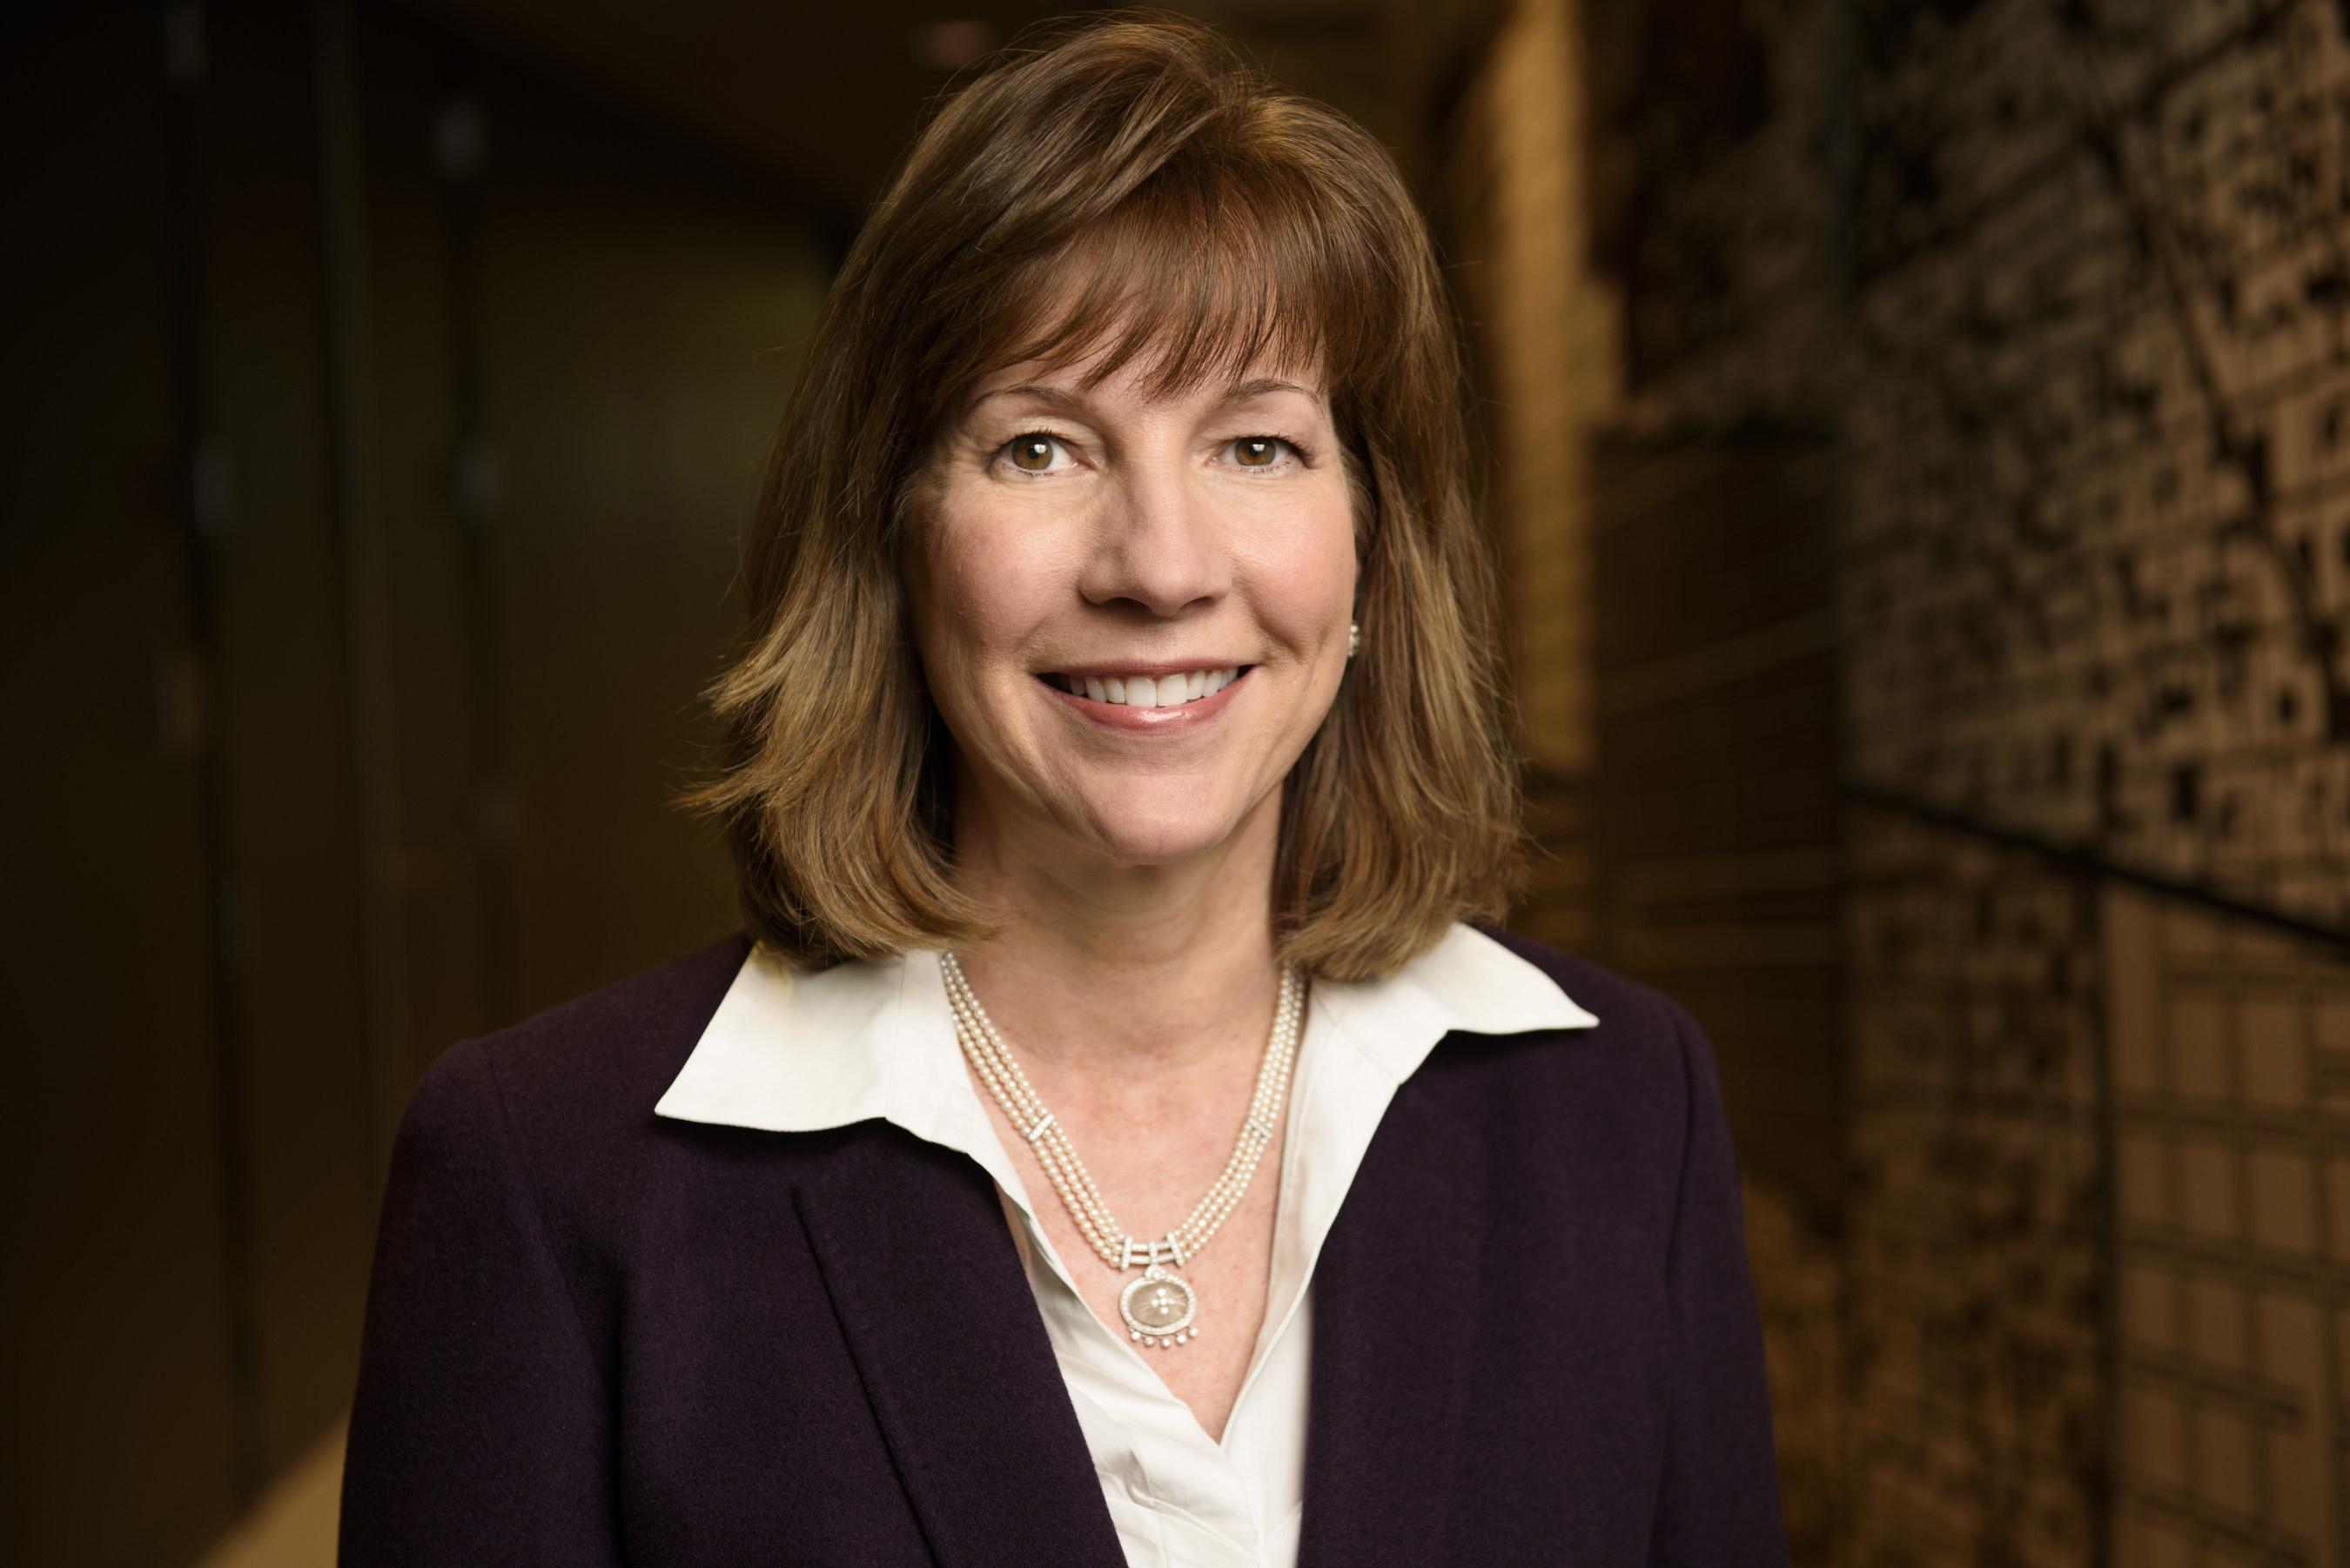 KPMG U.S. Chairman and CEO-elect Lynne Doughtie